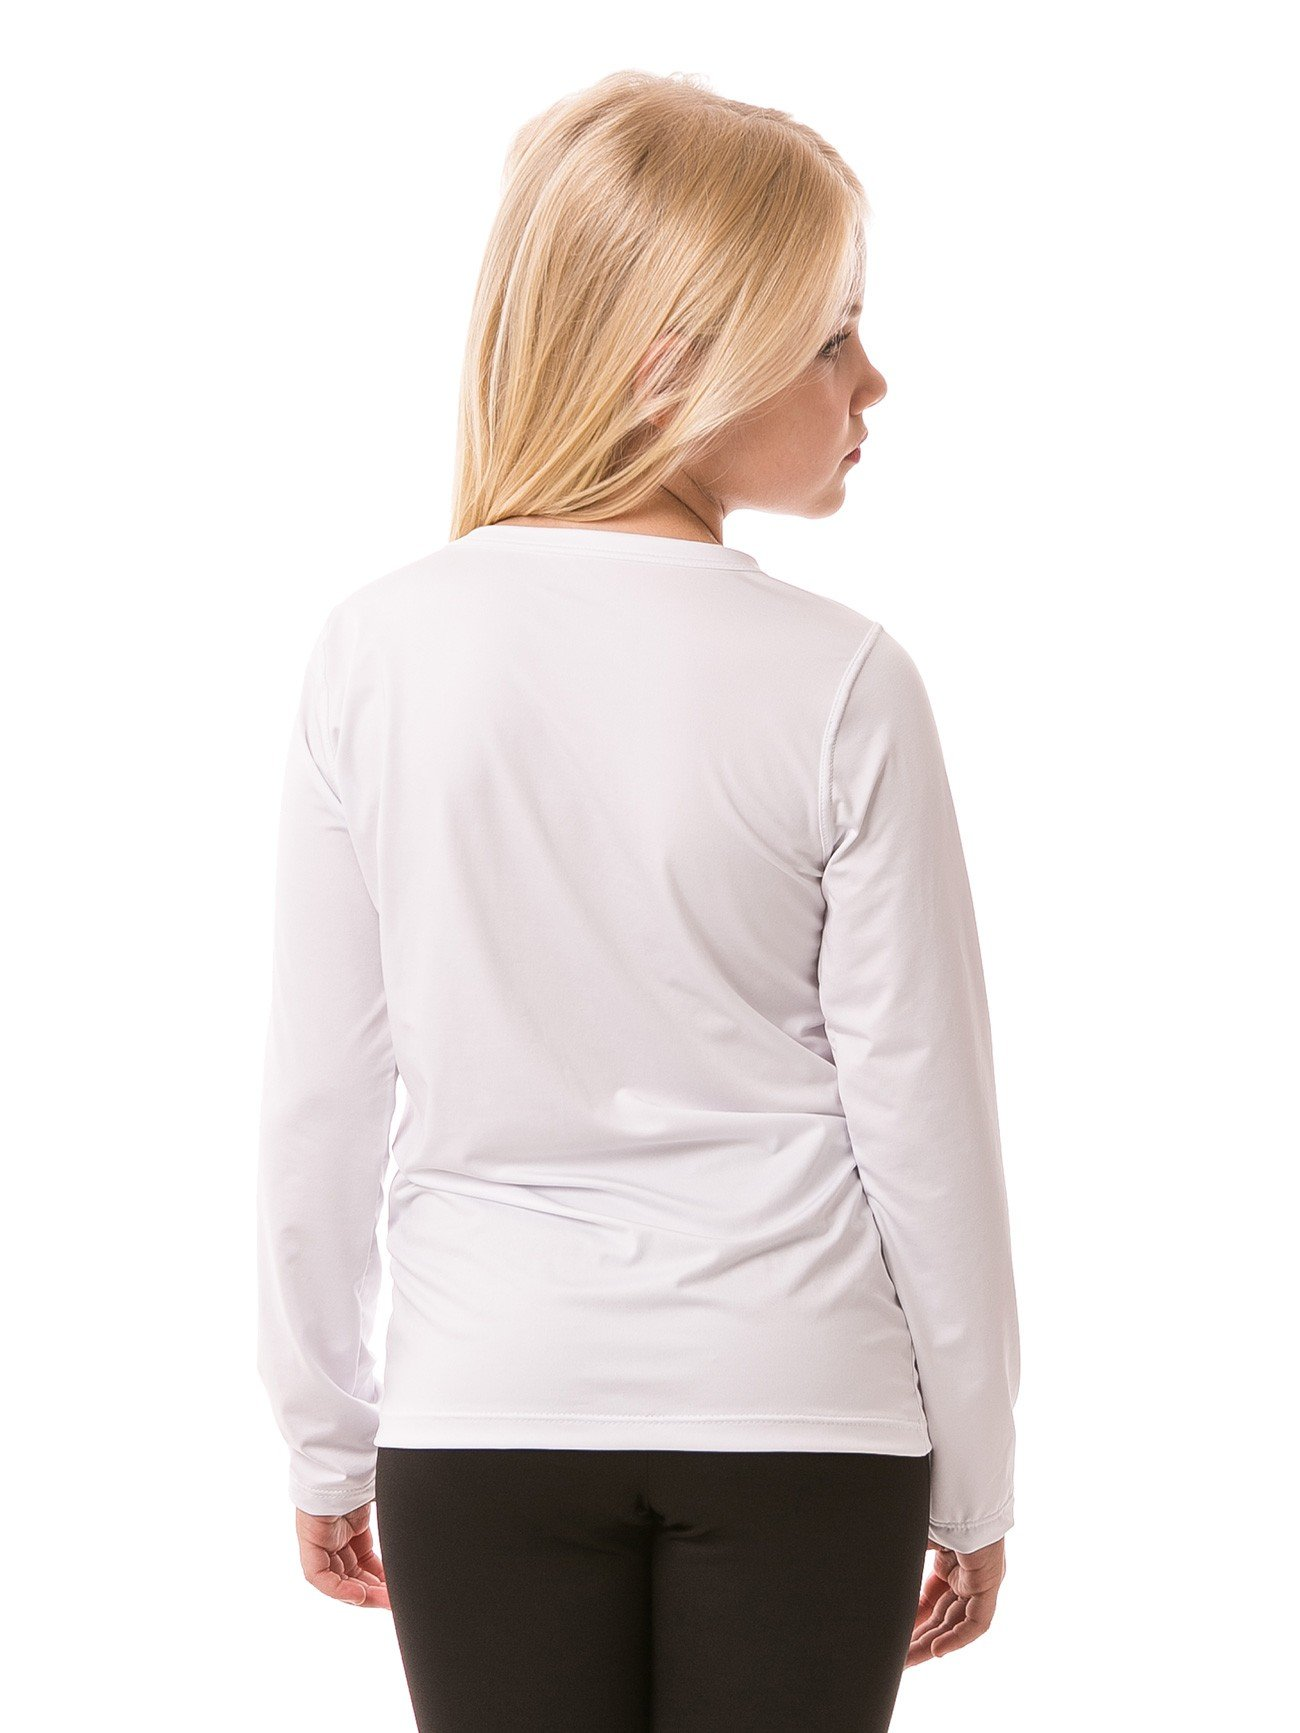 camiseta infantil feminina longa ice branca costas b